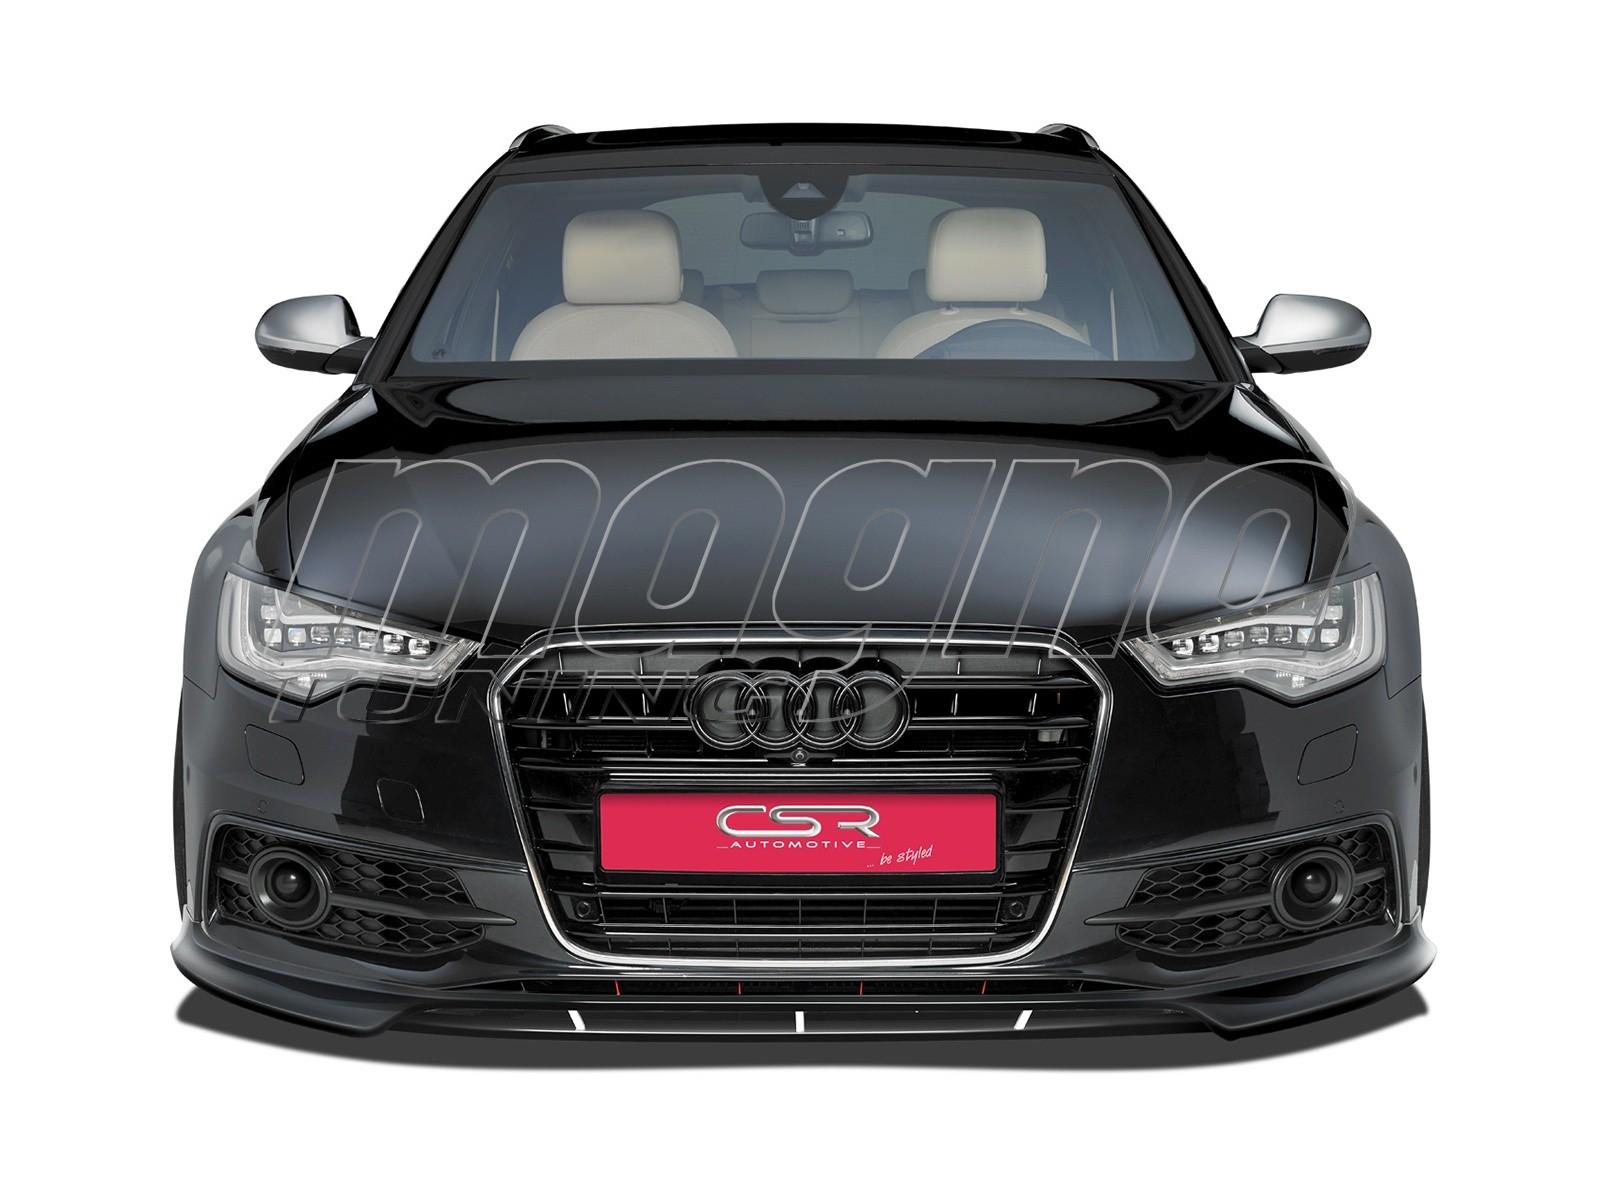 Audi A6 C7 4g Crono Front Per Extension